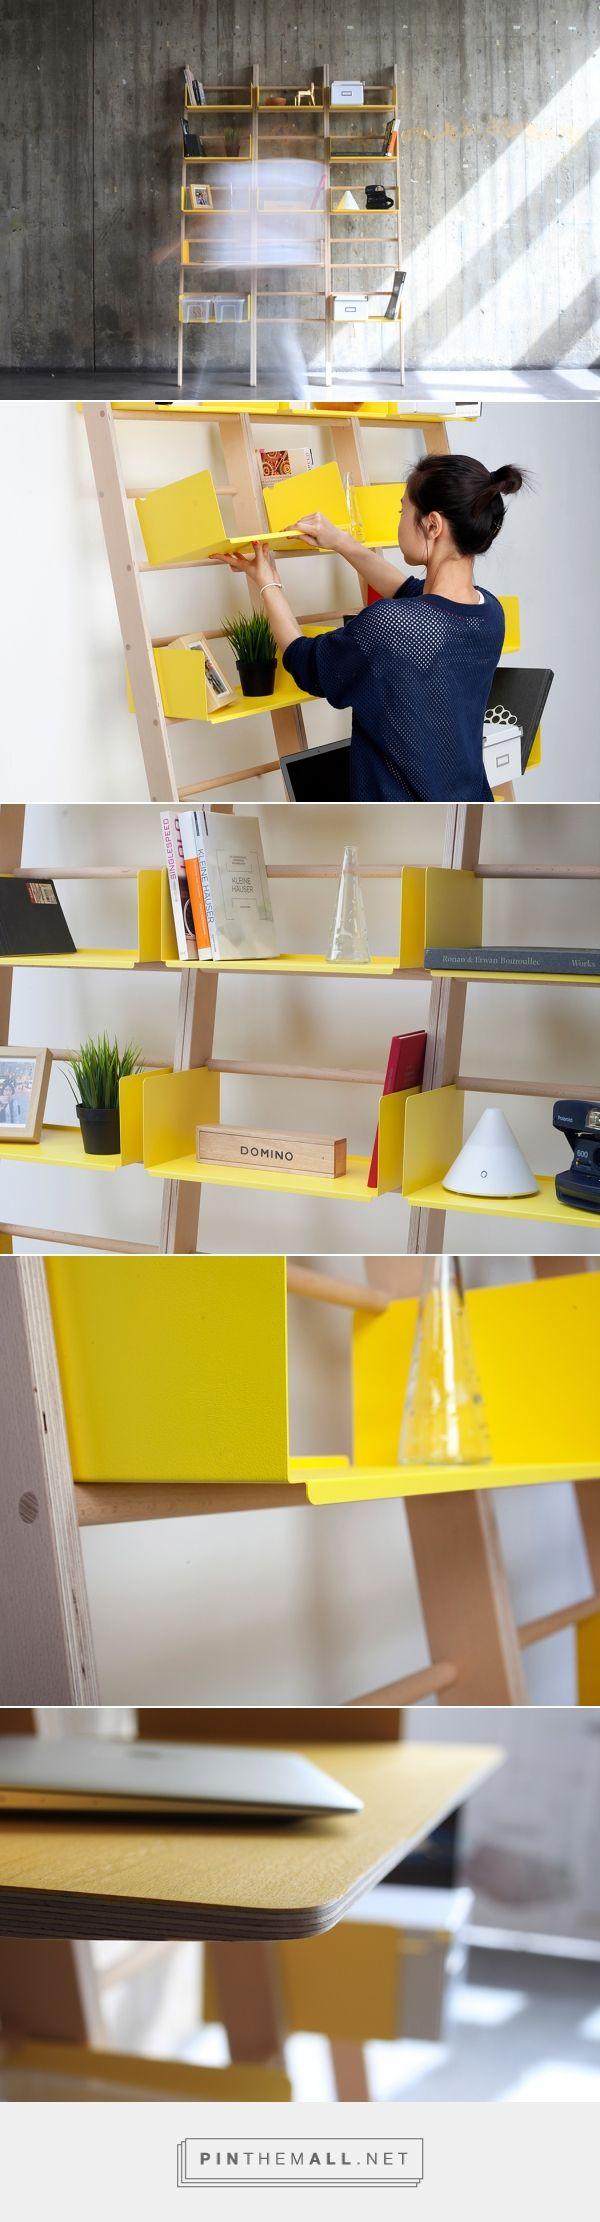 Best 25 Modular Furniture Ideas On Pinterest Modular Sofa Bed Spare Bedro